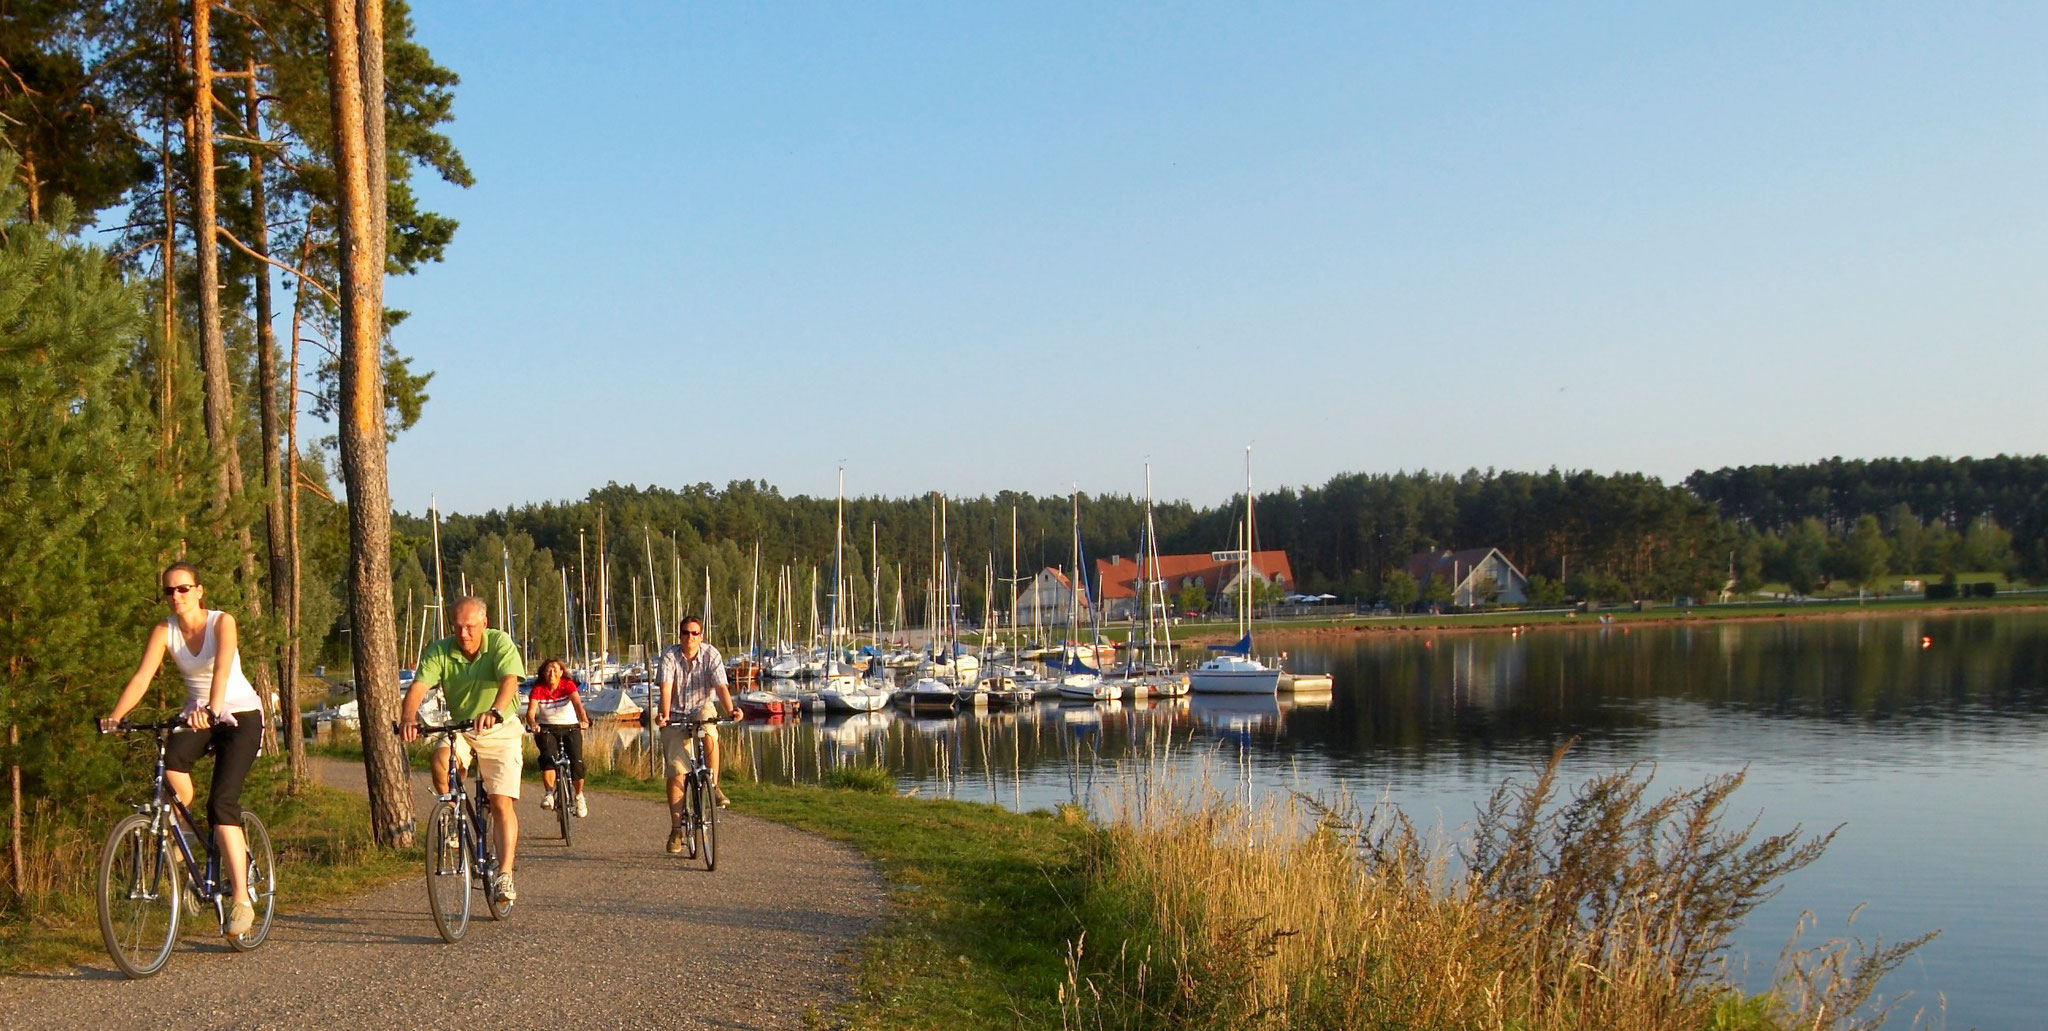 Hafen am Rothsee